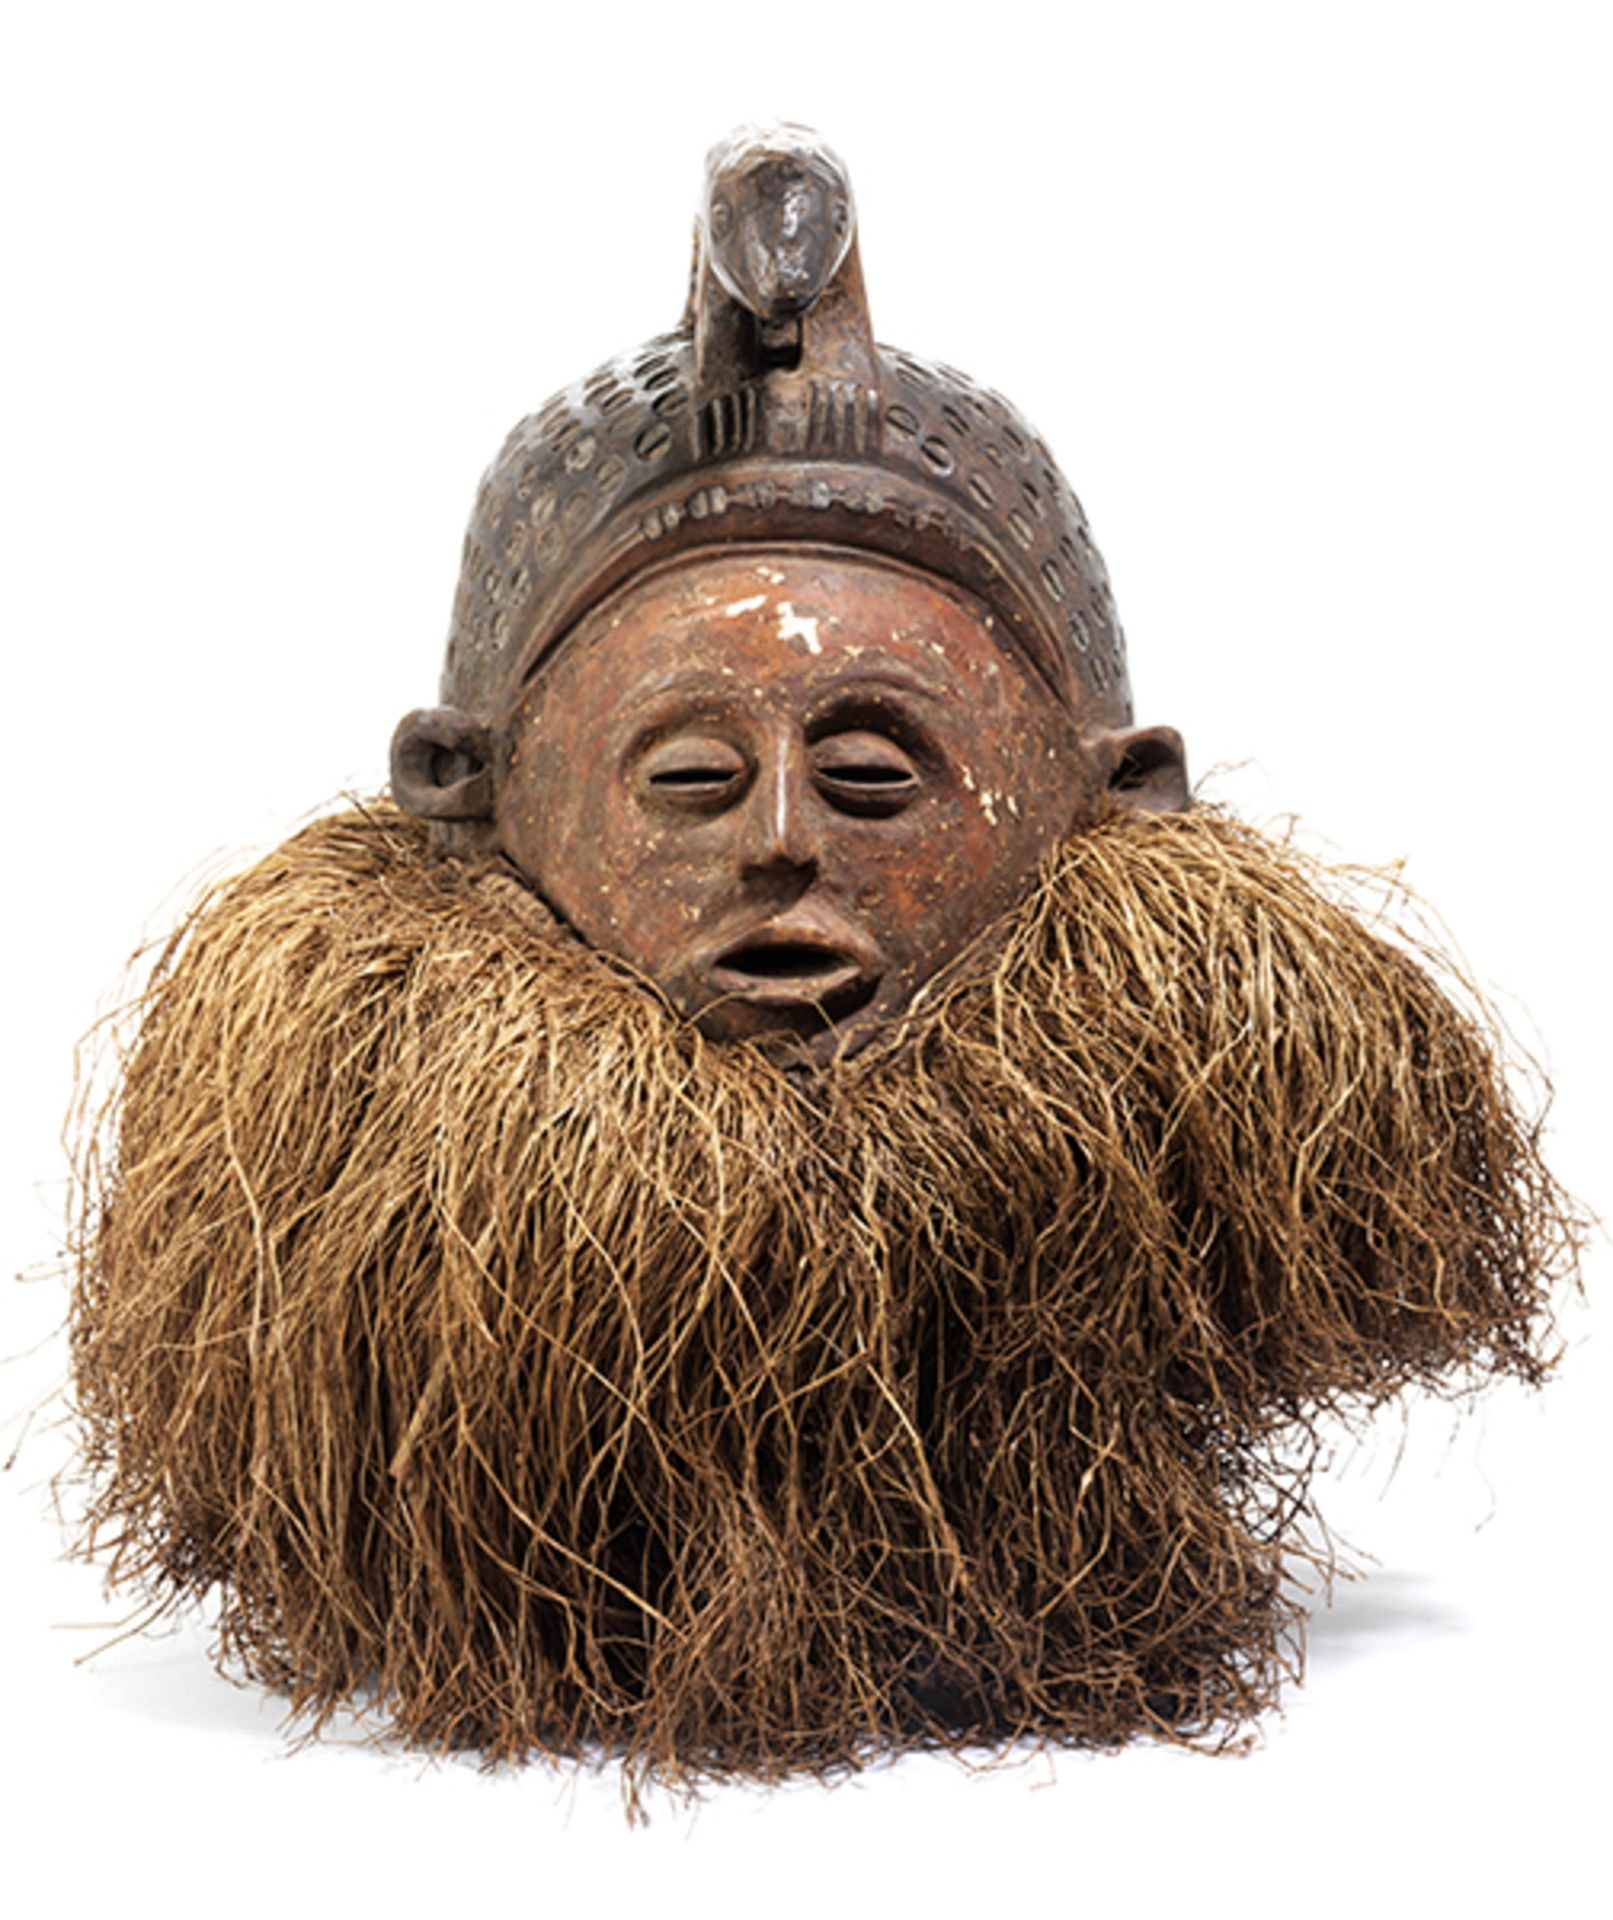 Los 905 - Helmmaske Höhe: 26 cm. Volk der Holo, Angola/ Demokratische Republik Kongo, 20. Jahrhundert....